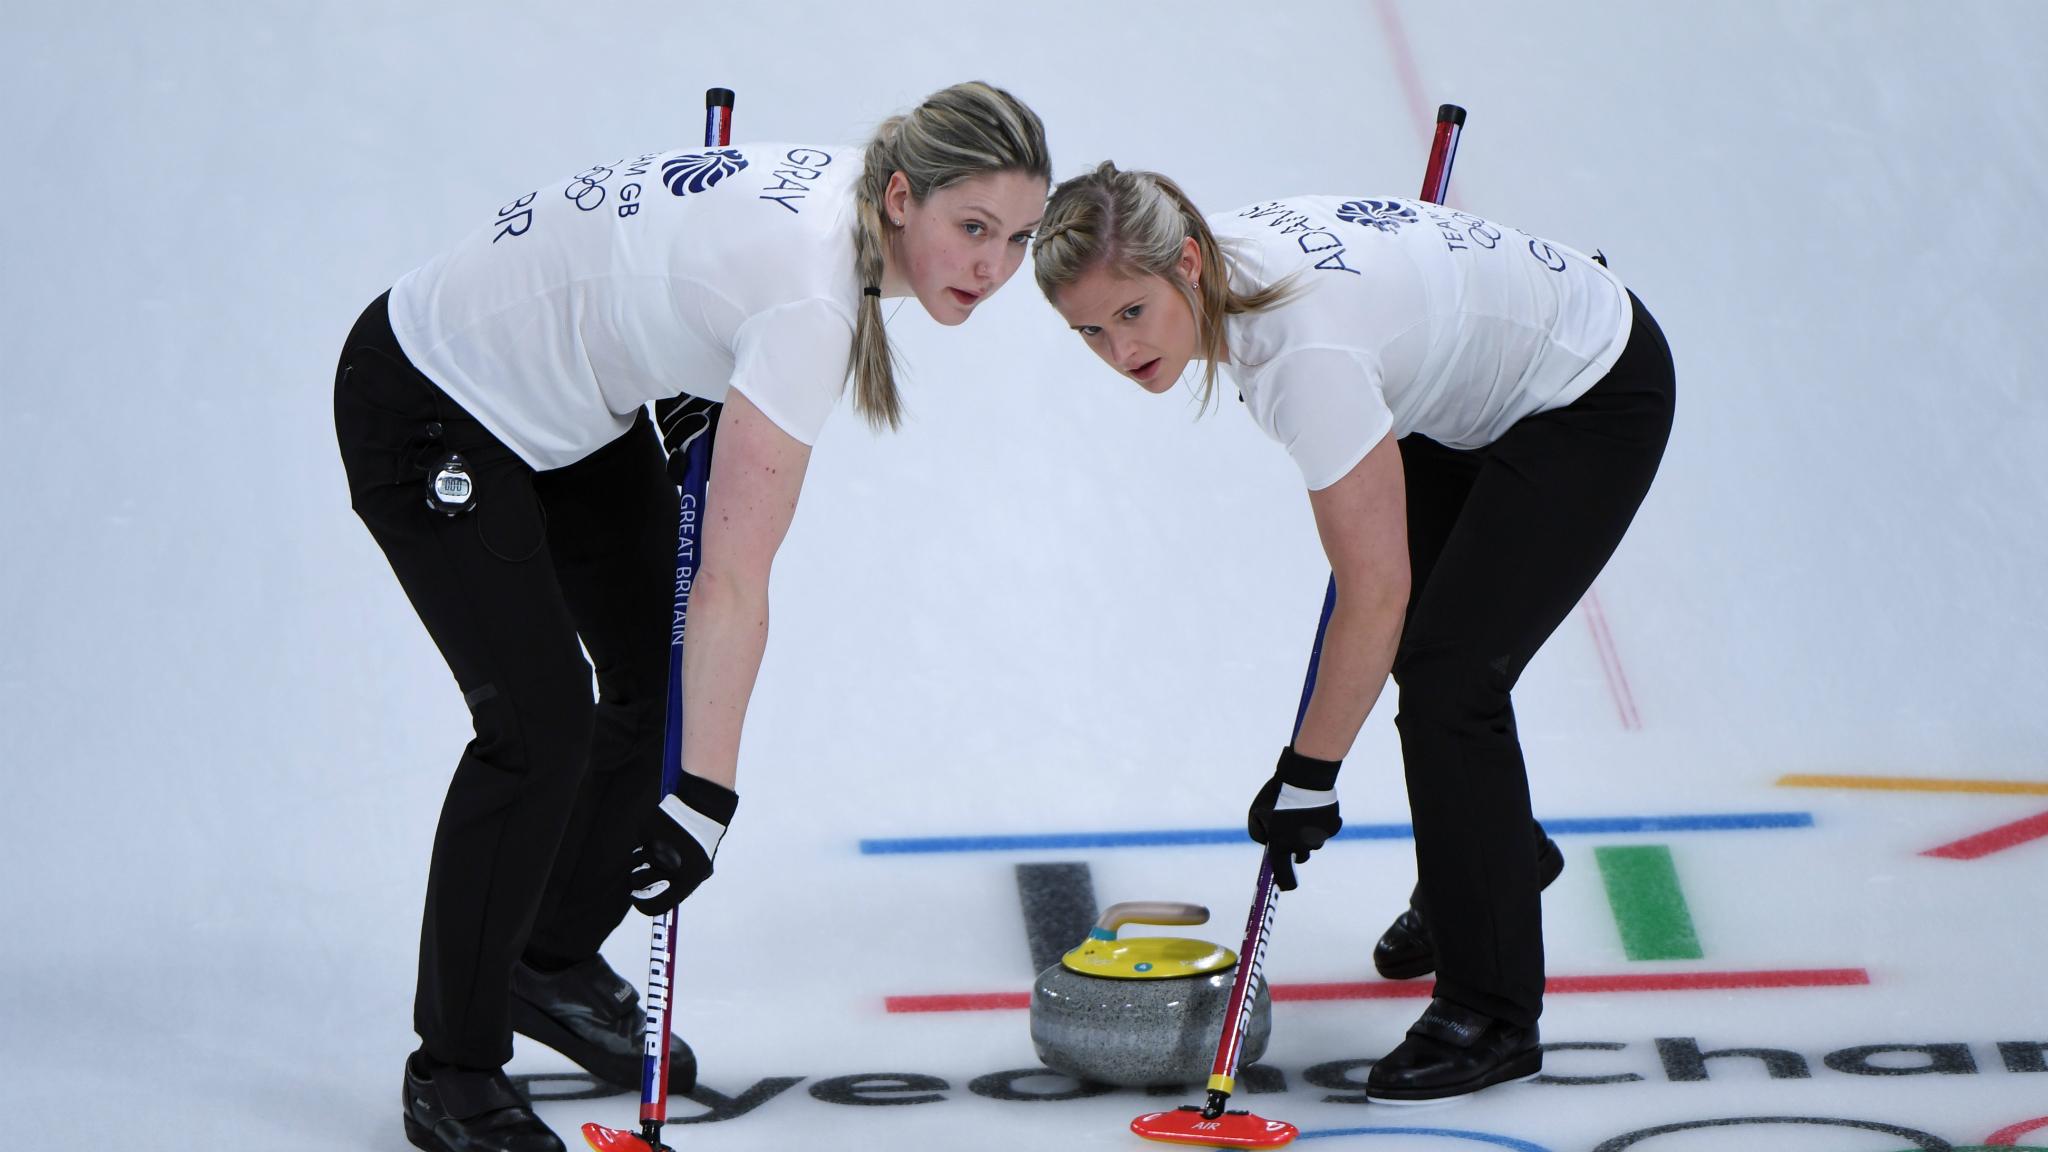 nude-women-curling-team